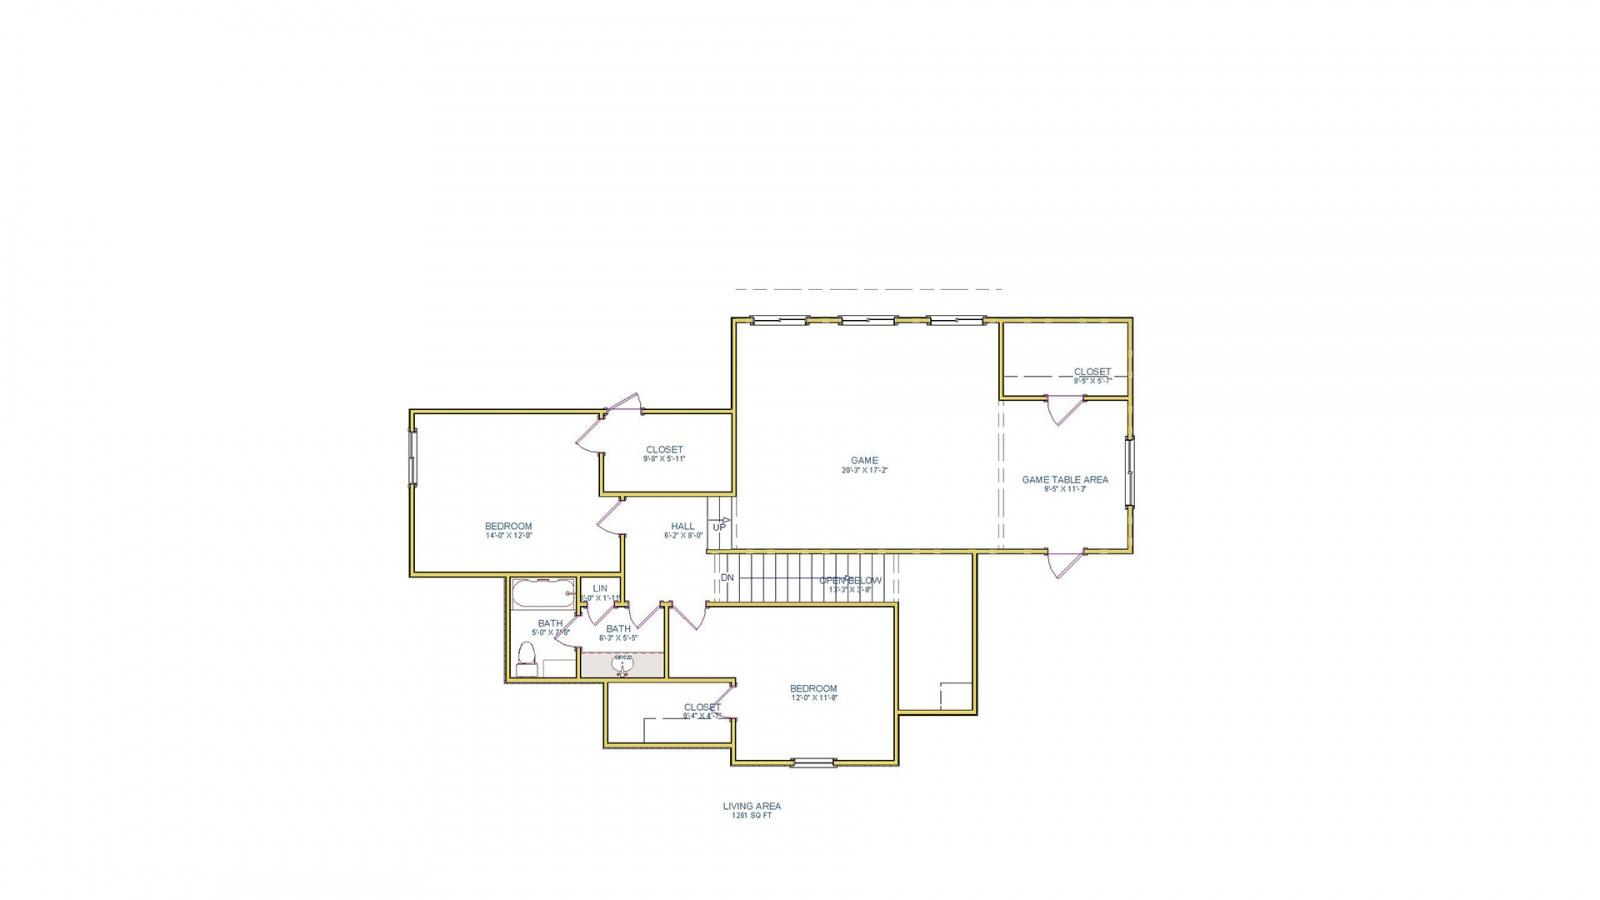 4 Bedrooms Bedrooms, ,3 BathroomsBathrooms,Select Home,Home Plans,1078